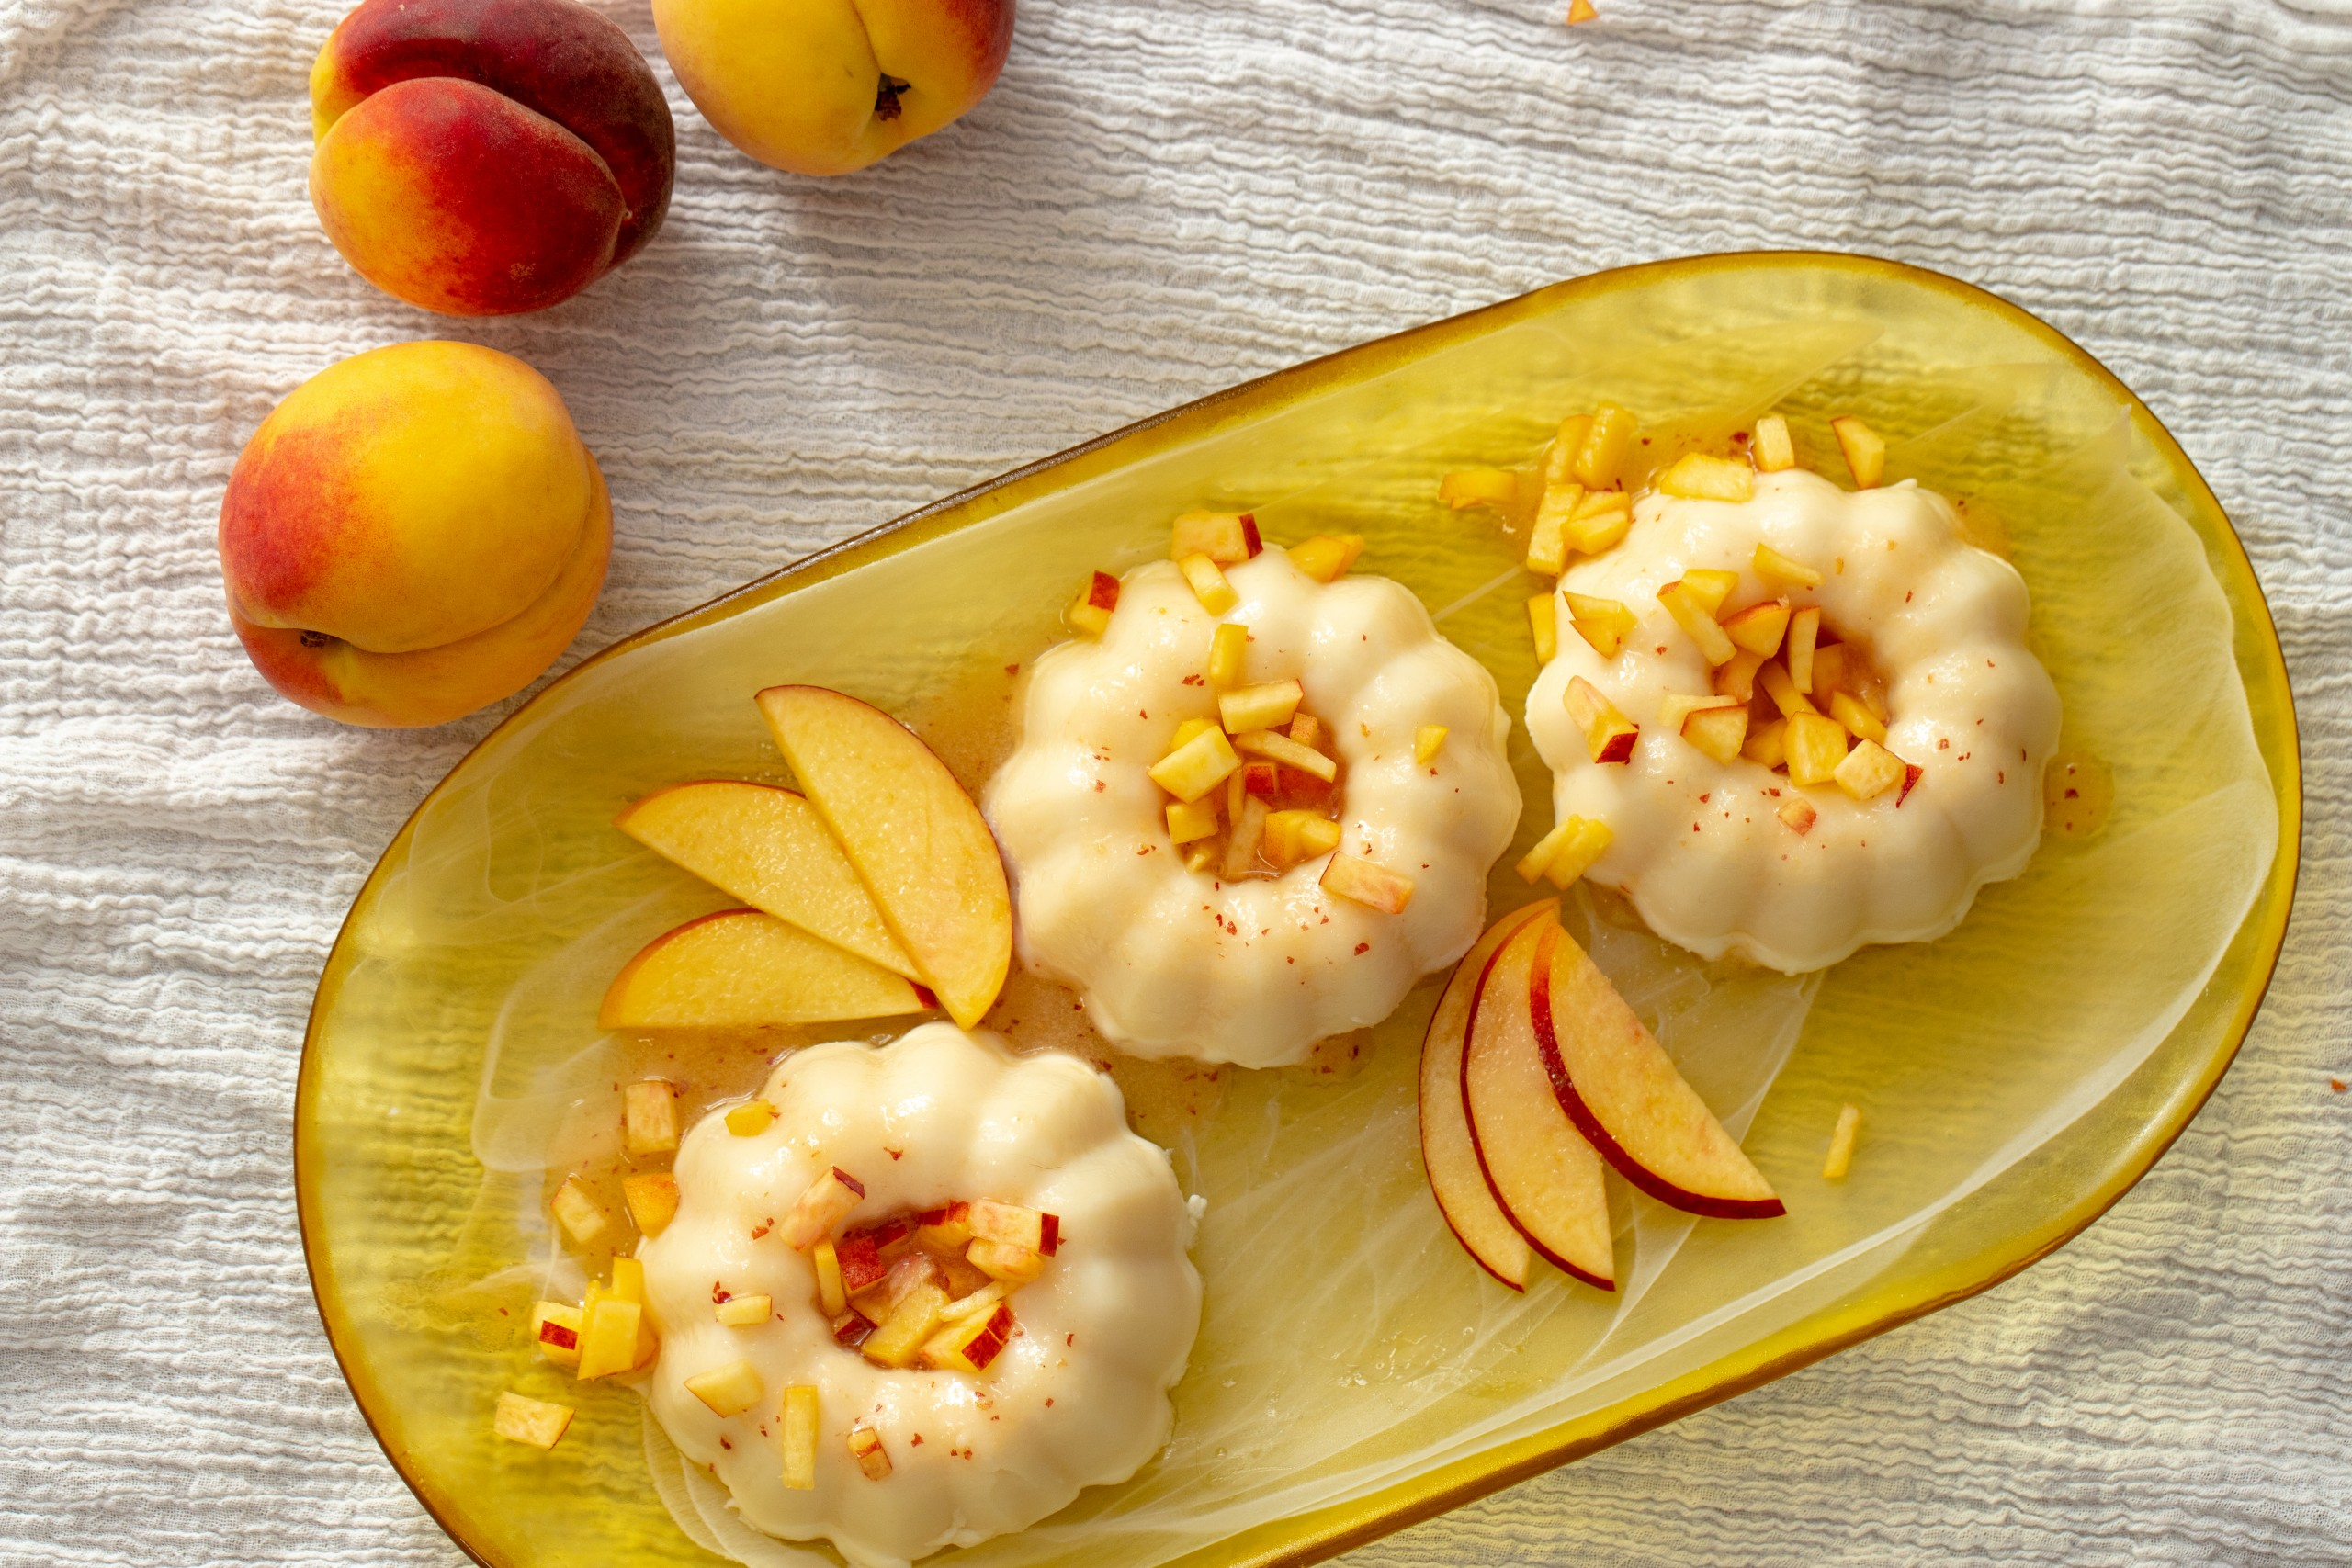 gelatina with a fresh peach sauce